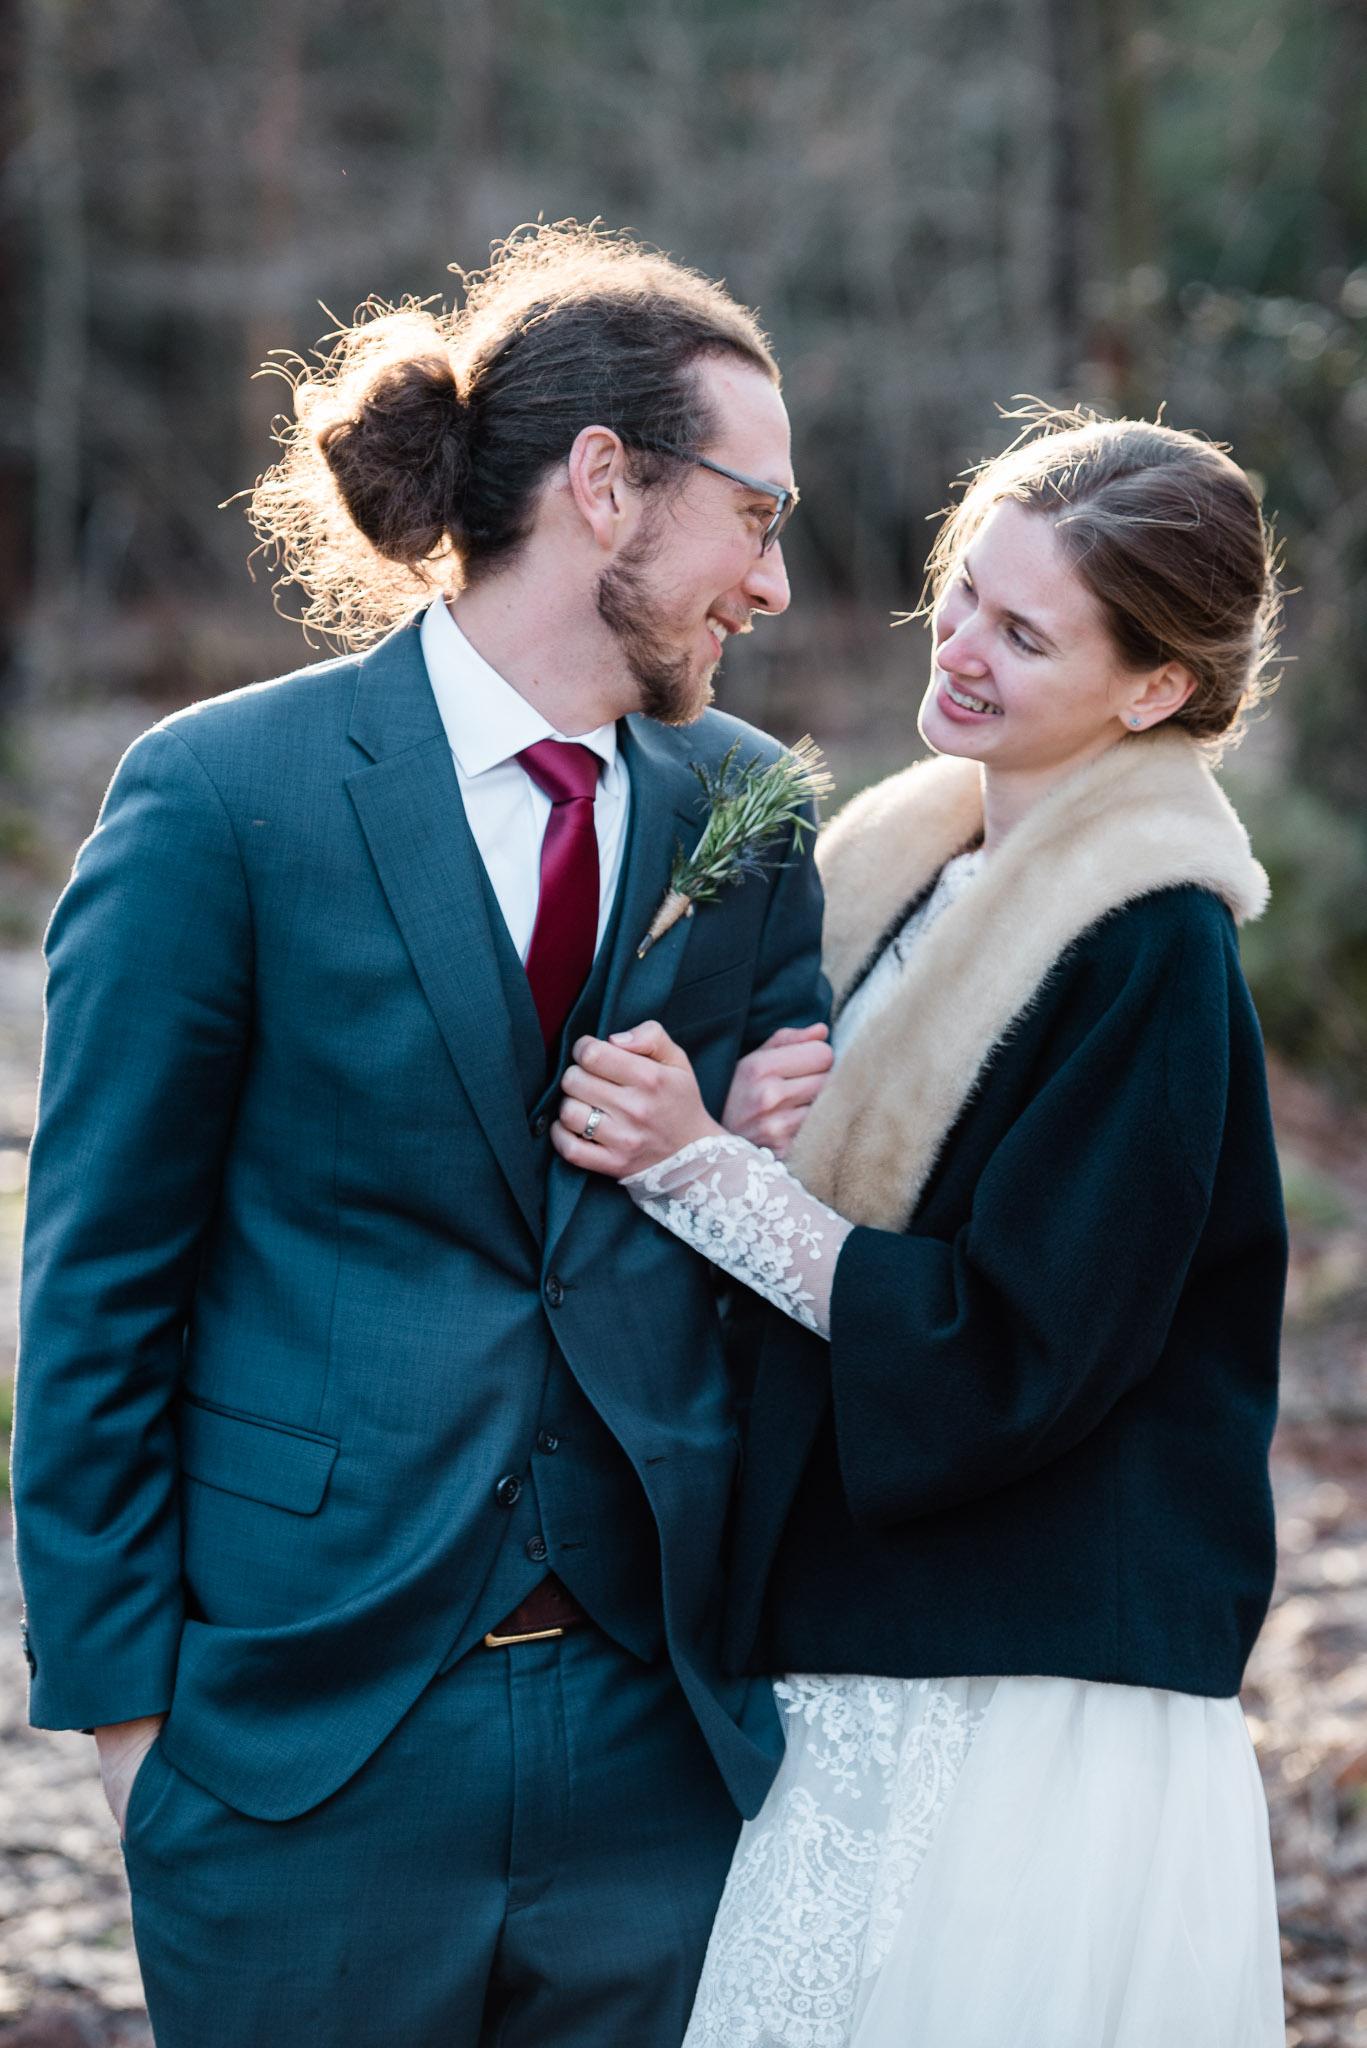 Wedding Couples portrait, Ligonier Wedding Photographer, Ligonier PA wedding, wedding potraits-1348.jpg